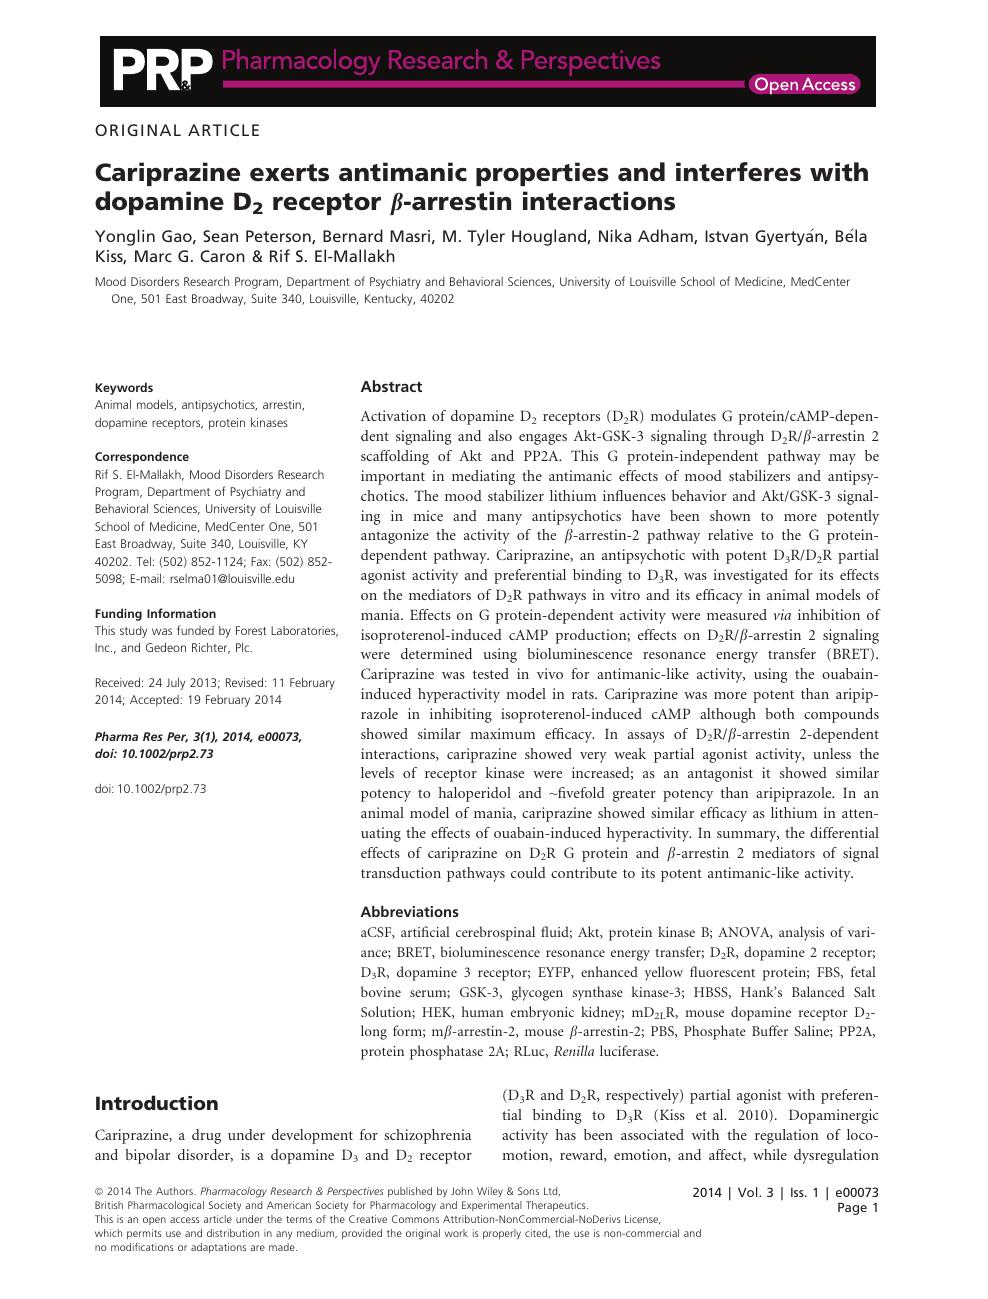 Cariprazine exerts antimanic properties and interferes with dopamine